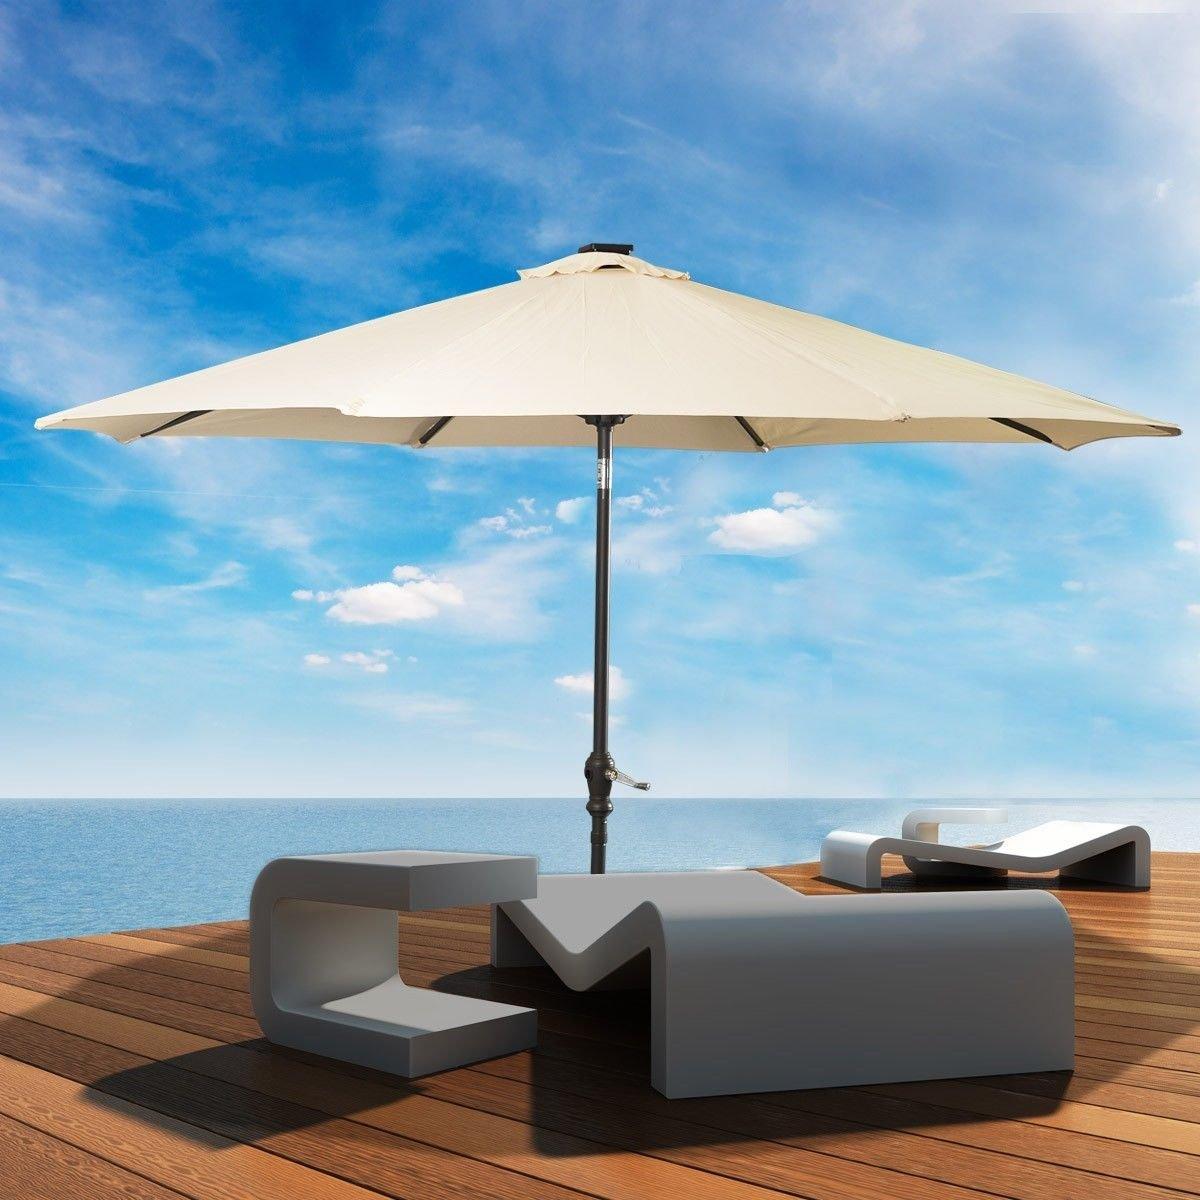 Amazon.com : LED Steel Pole Patio Solar Umbrella Outdoor Beach Garden Patio  Tiltable Beige 10FT : Garden U0026 Outdoor